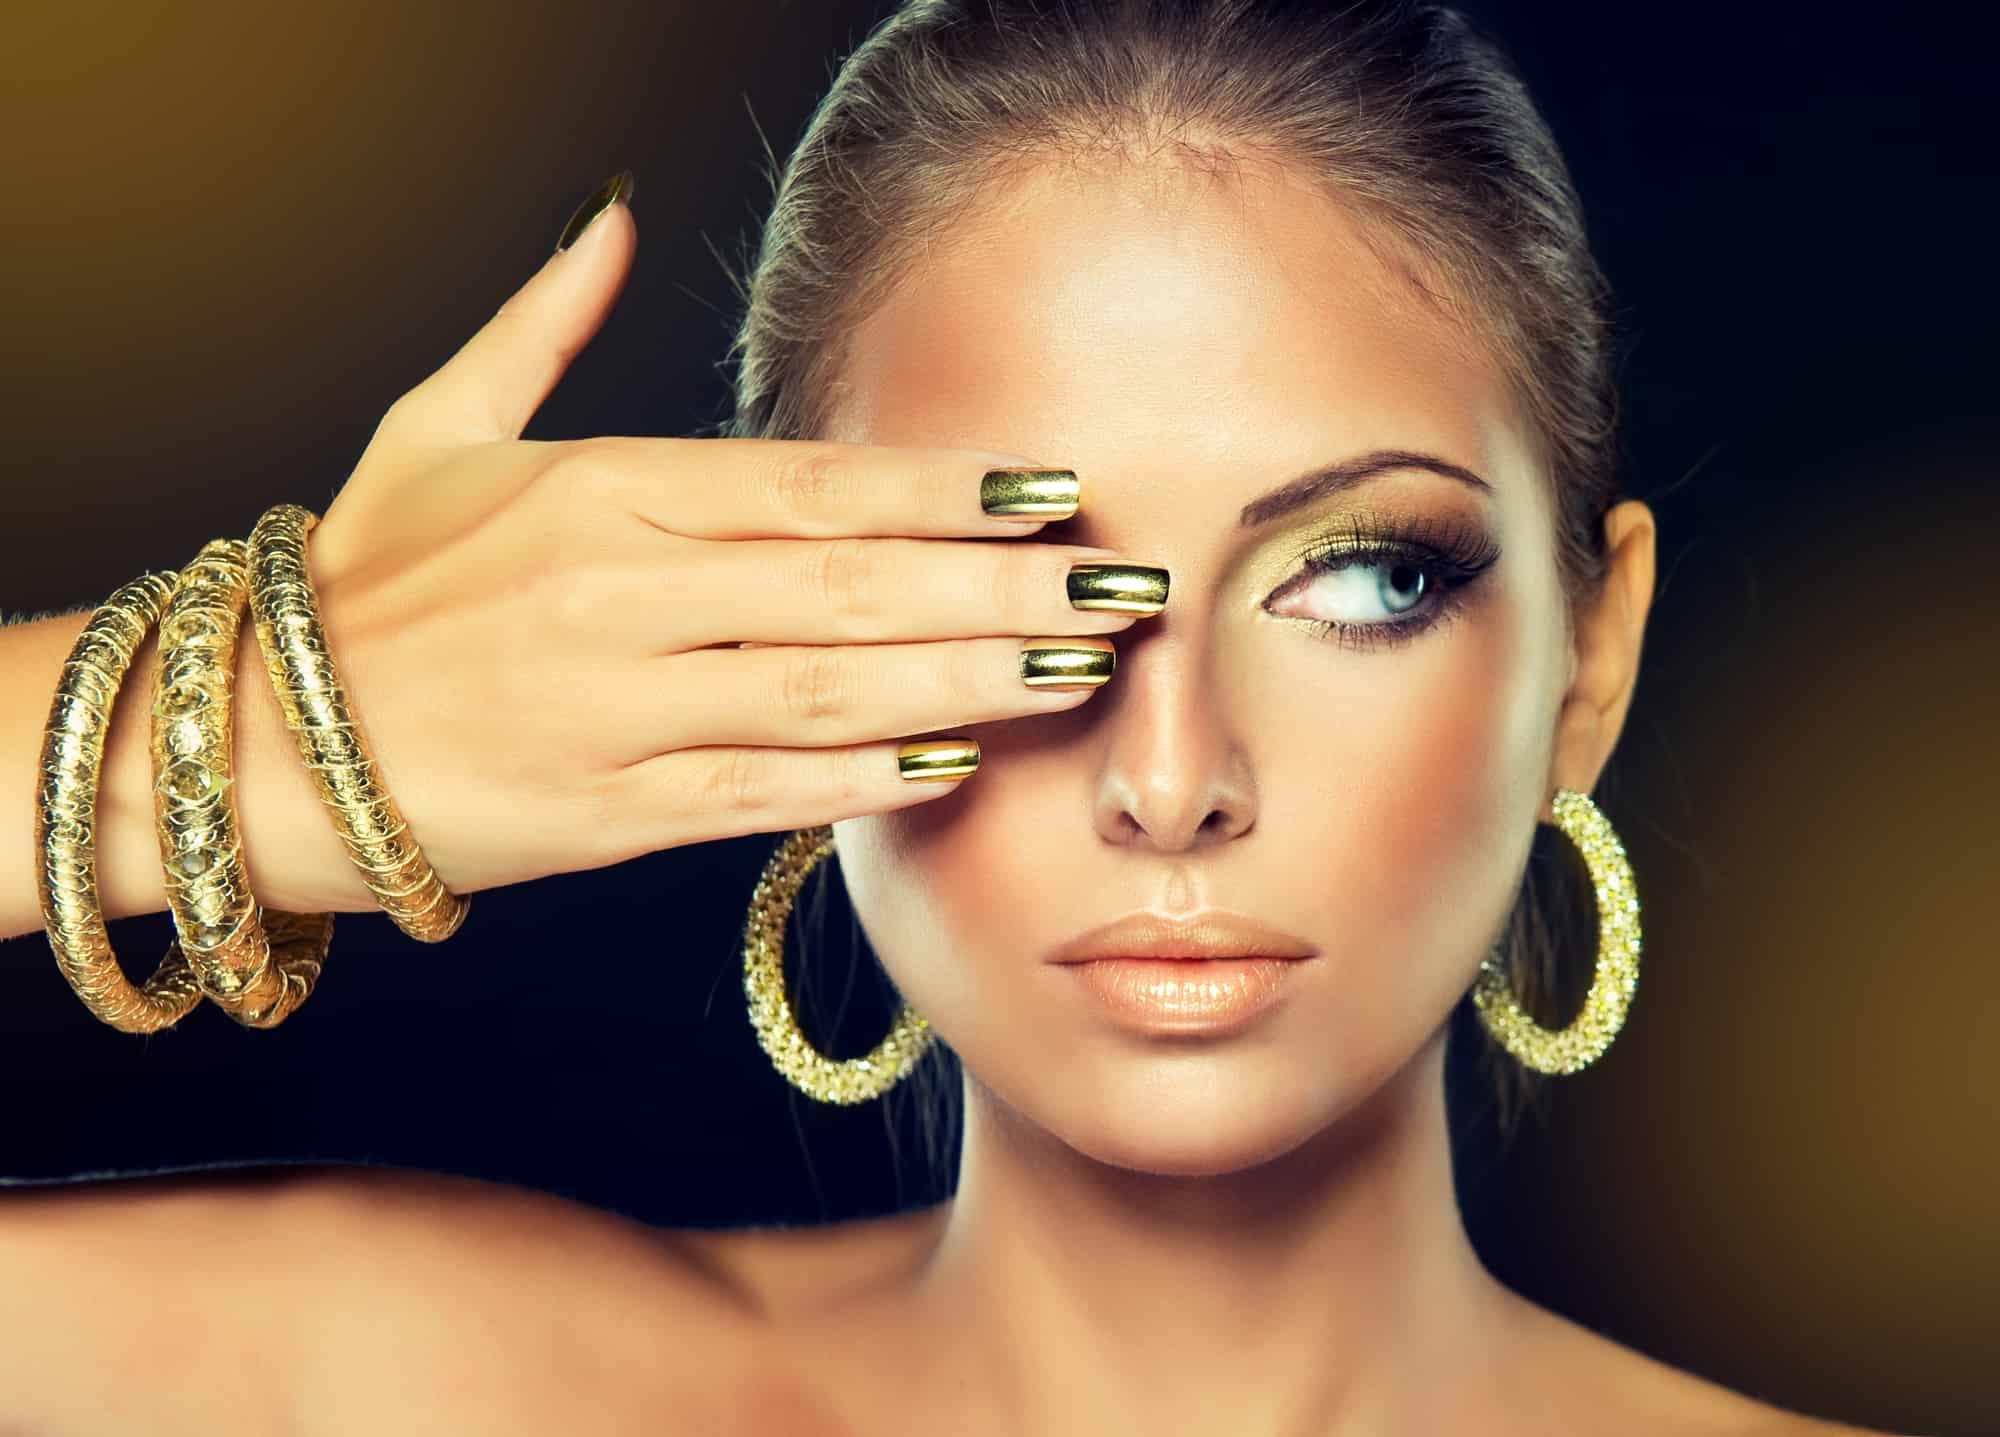 beautiful latina woman wearing non-toxic nail polish